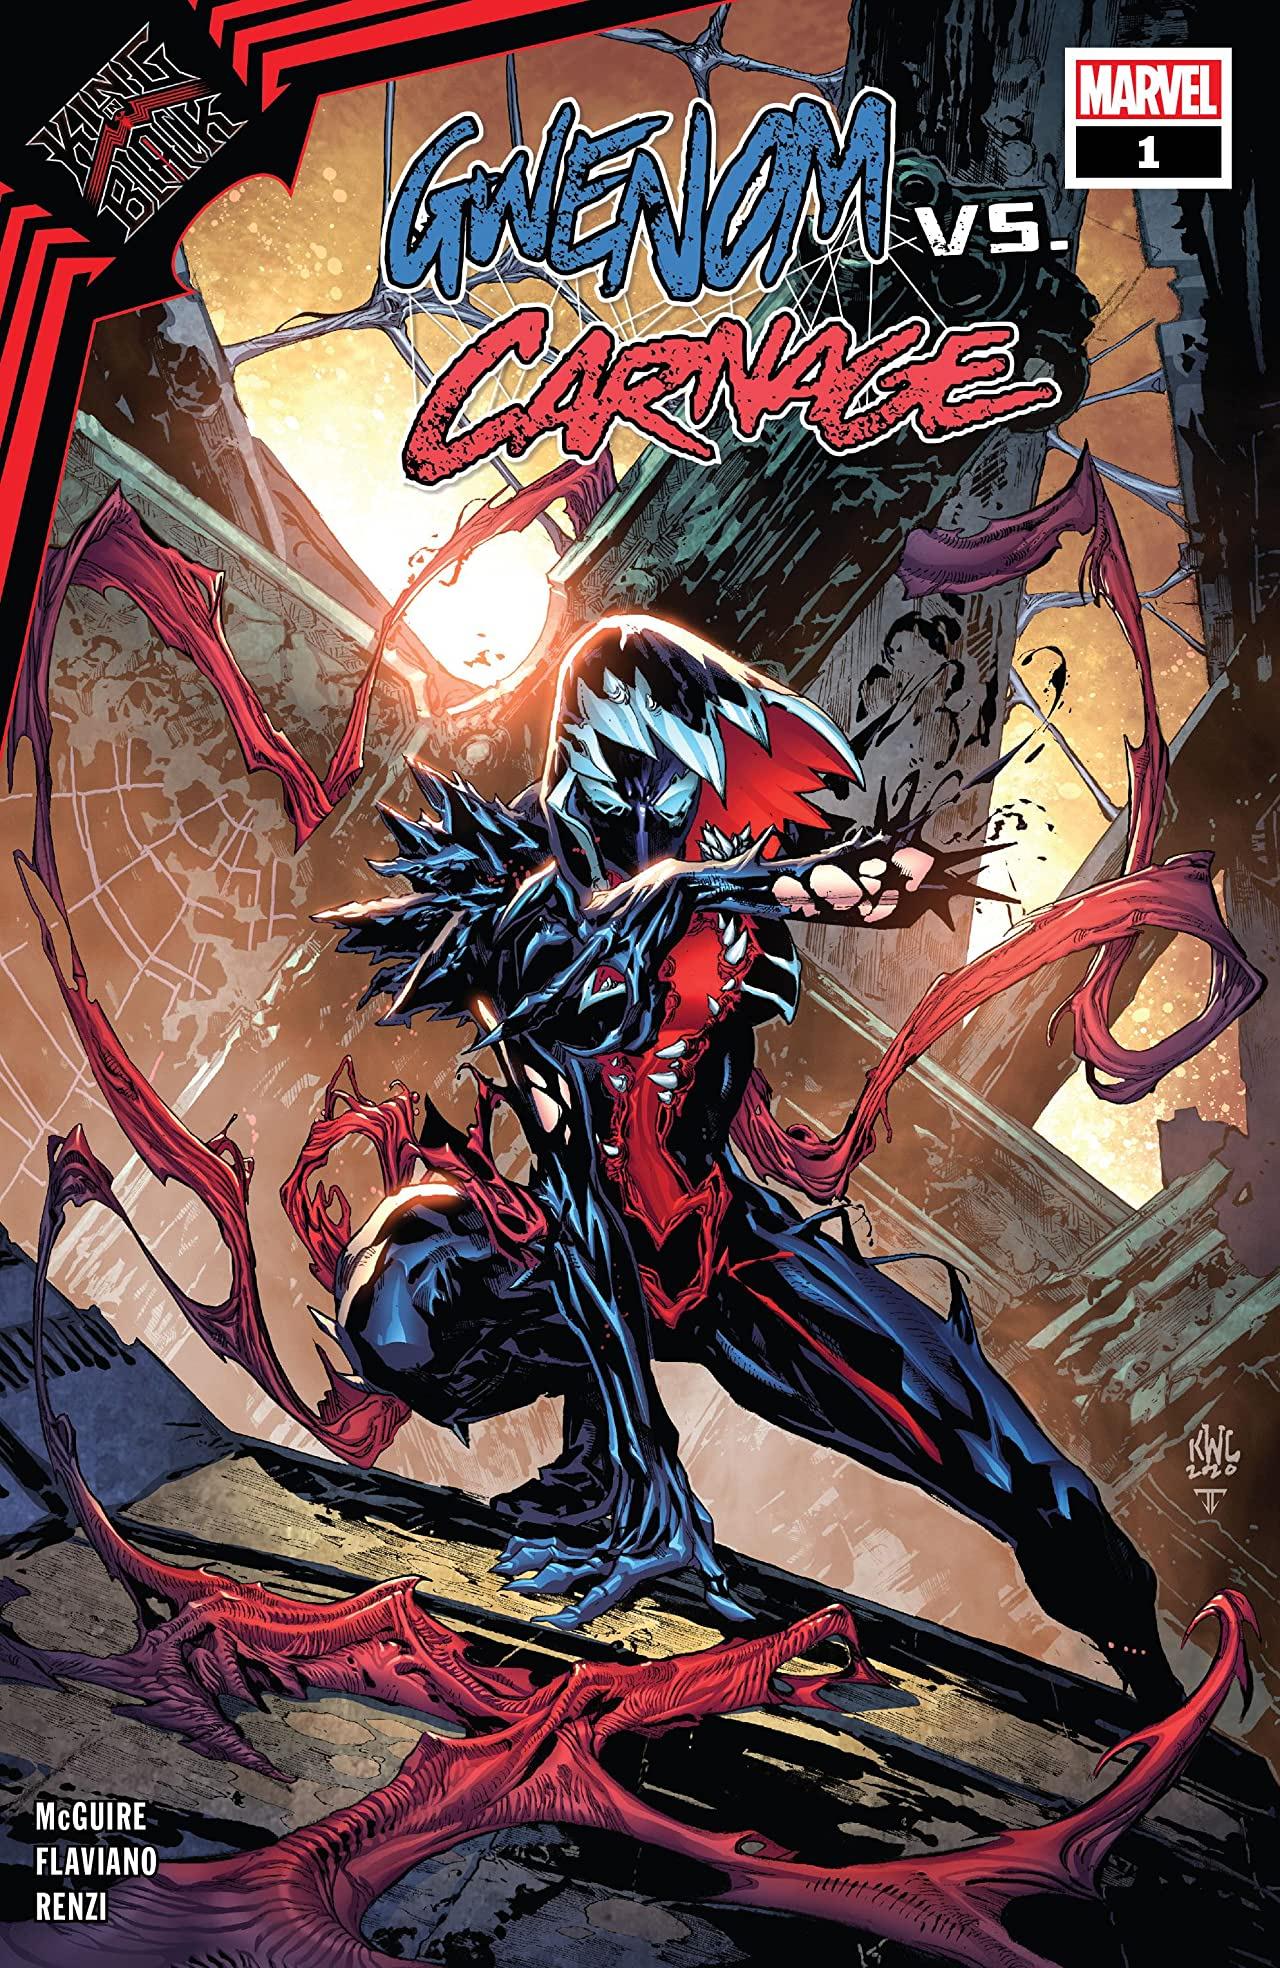 King in Black: Gwenom vs. Carnage Vol 1